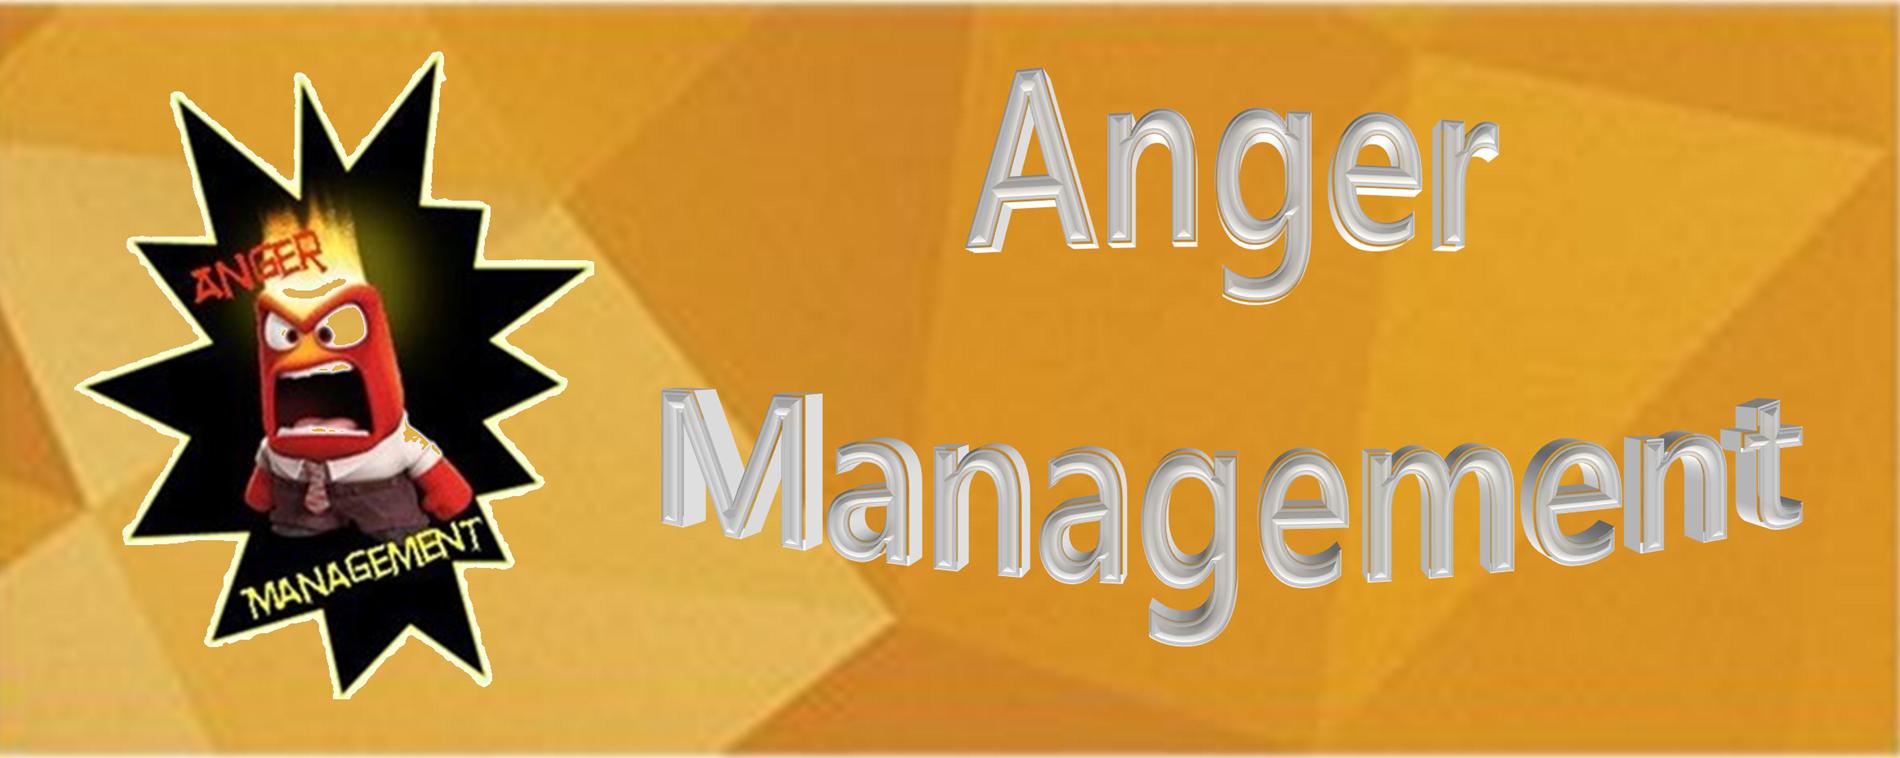 Anger Management Header